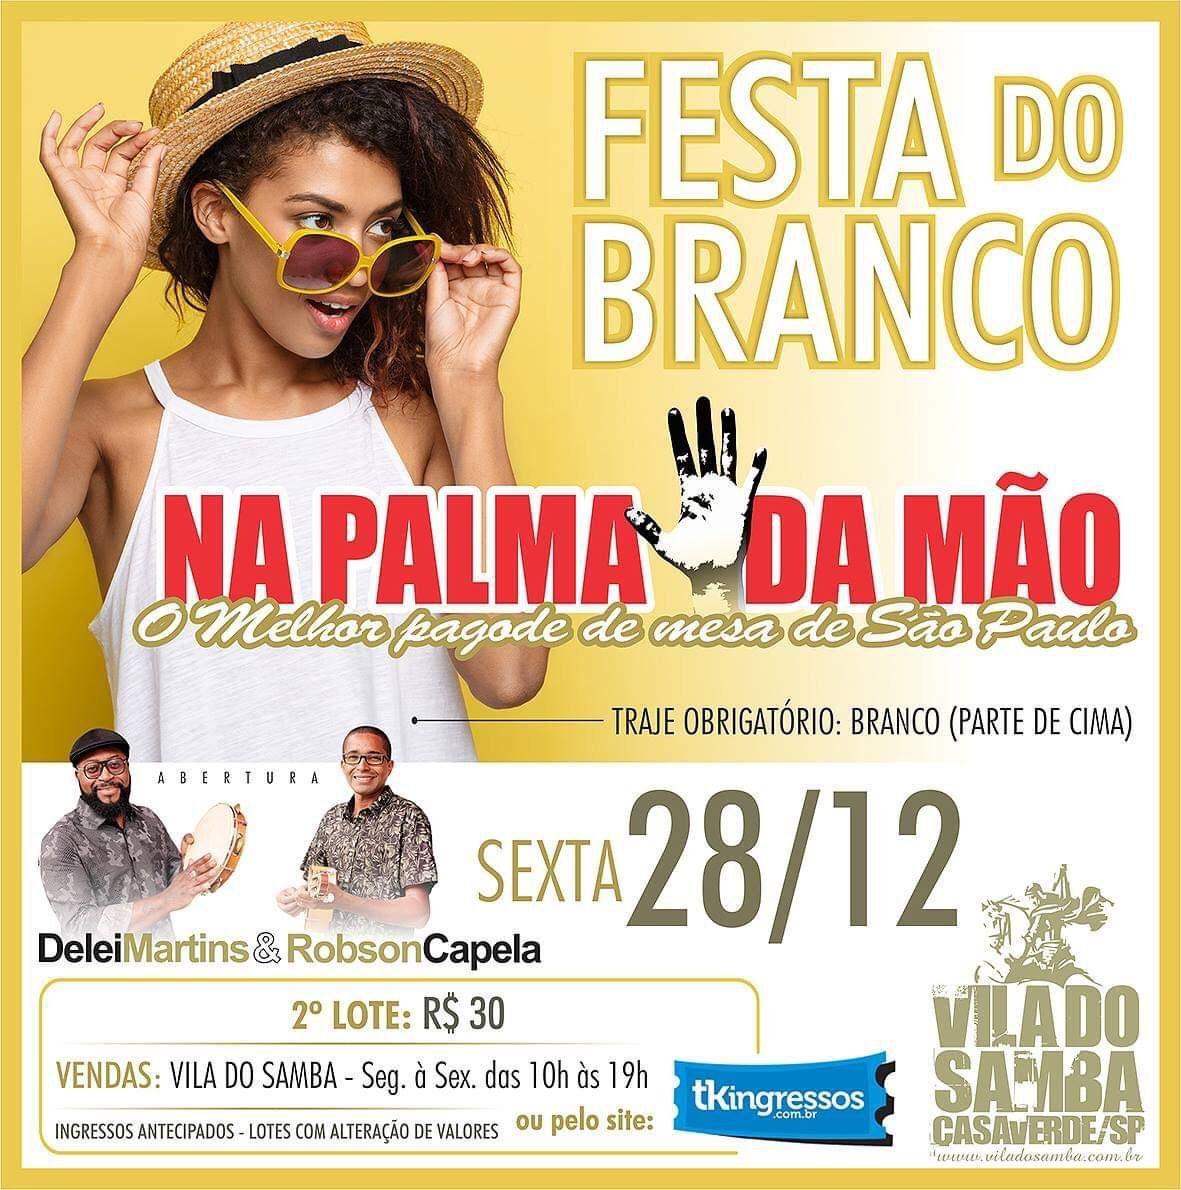 Festa do Branco - Vila do Samba - 28/12/18 - São Paulo - SP